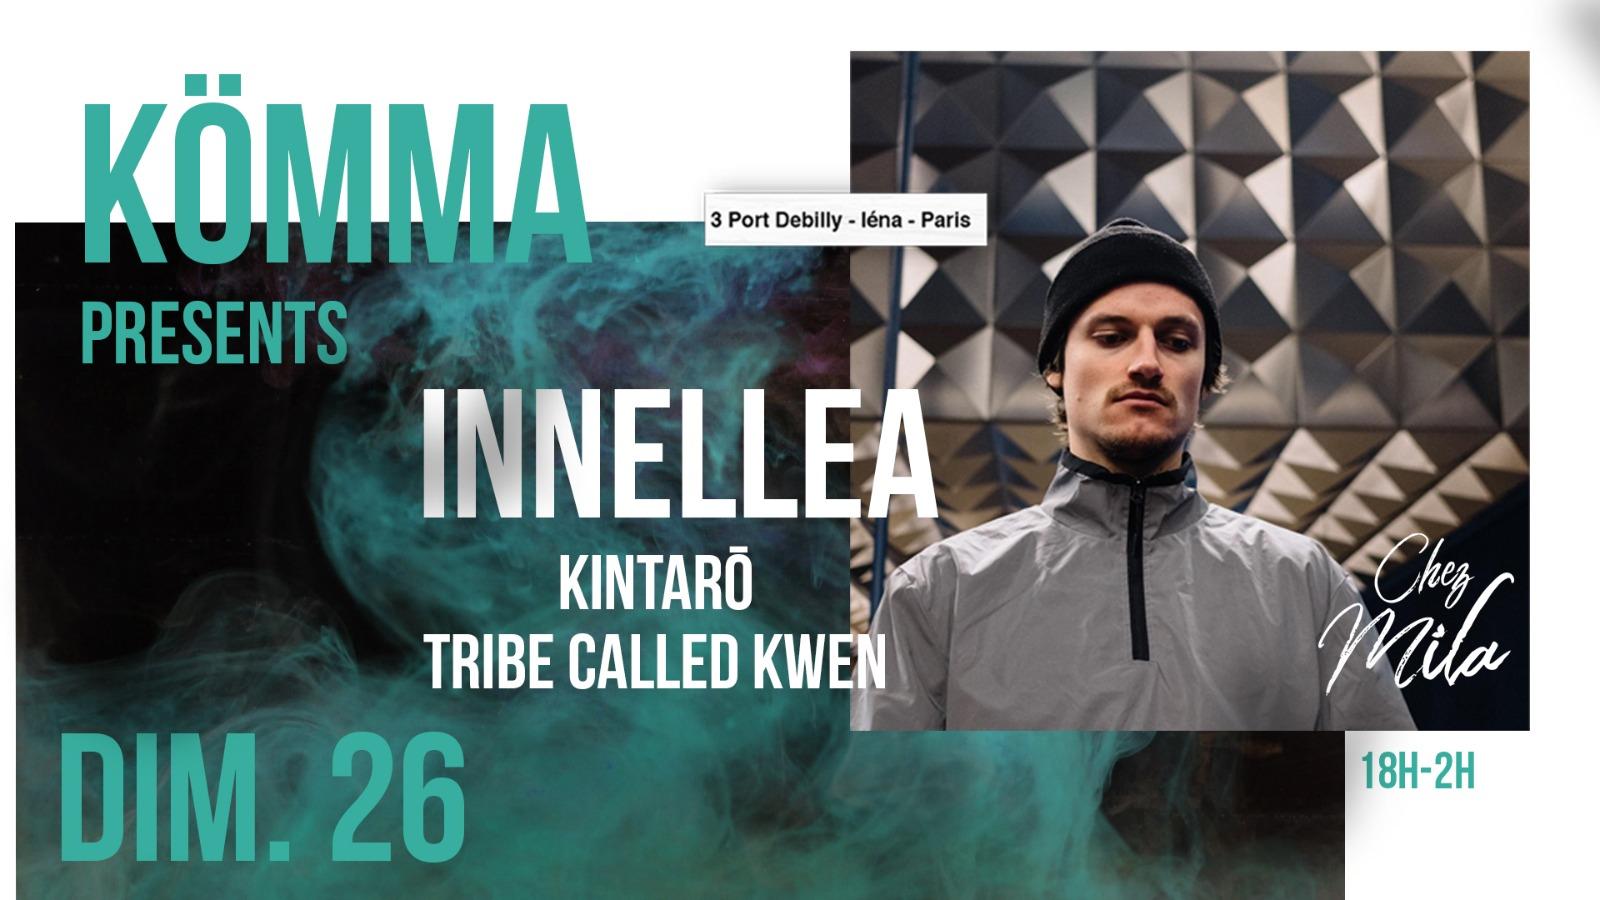 KÖMMA Paris x Chez Mila presents : Innellea (Afterlife)